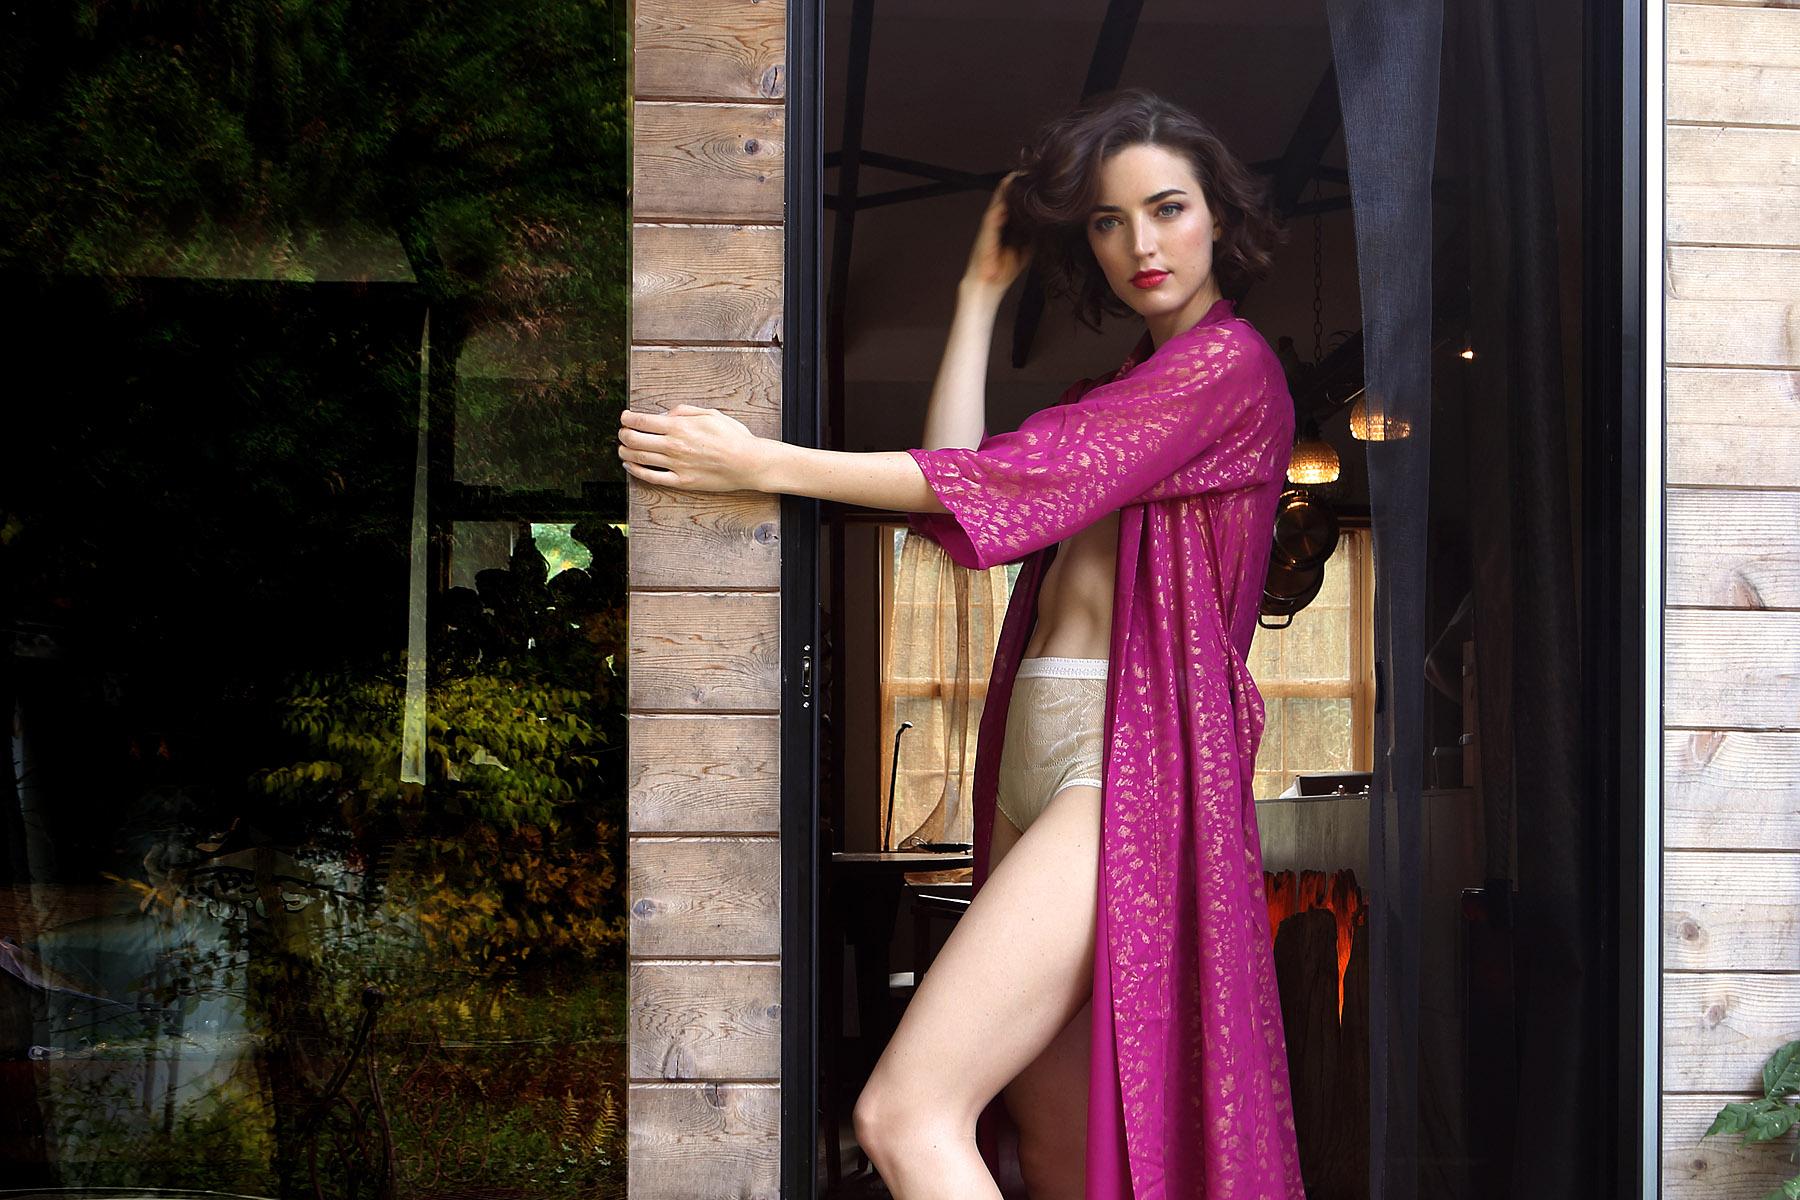 holiday-14-bts-lingerie-lookbook-raspberry-pink-gold-robe-porch-1.jpg